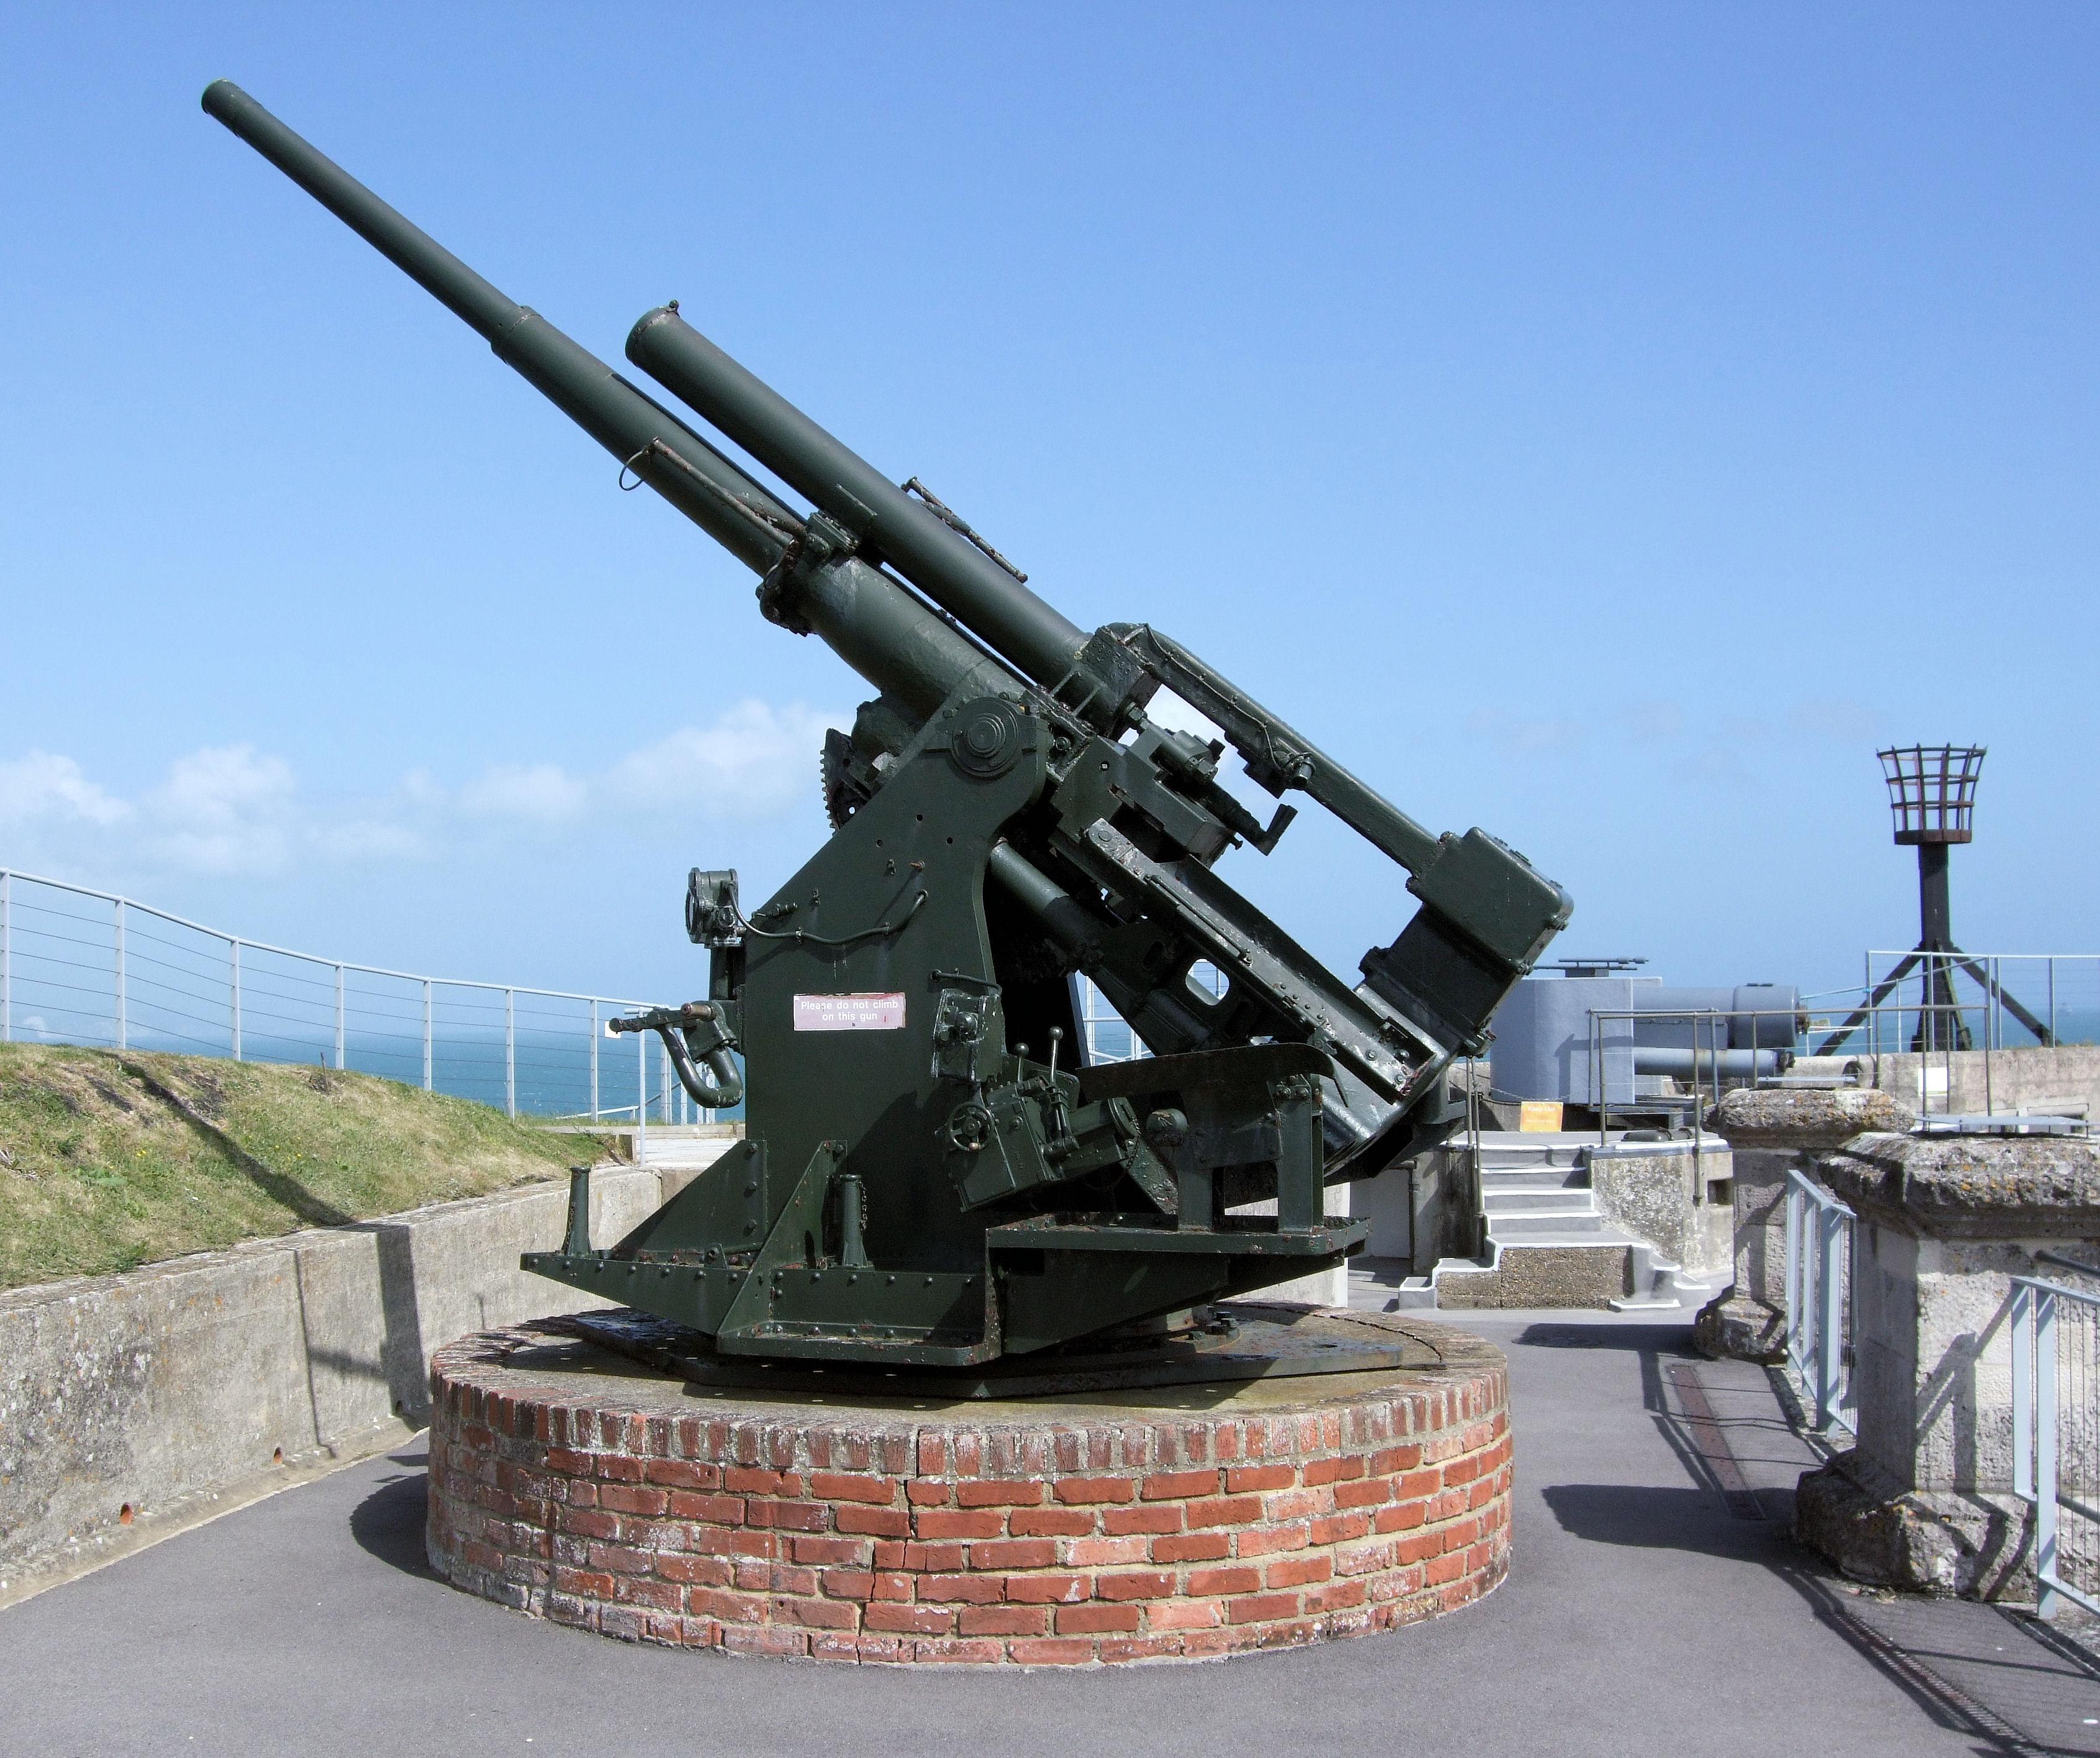 anti aircraft guns